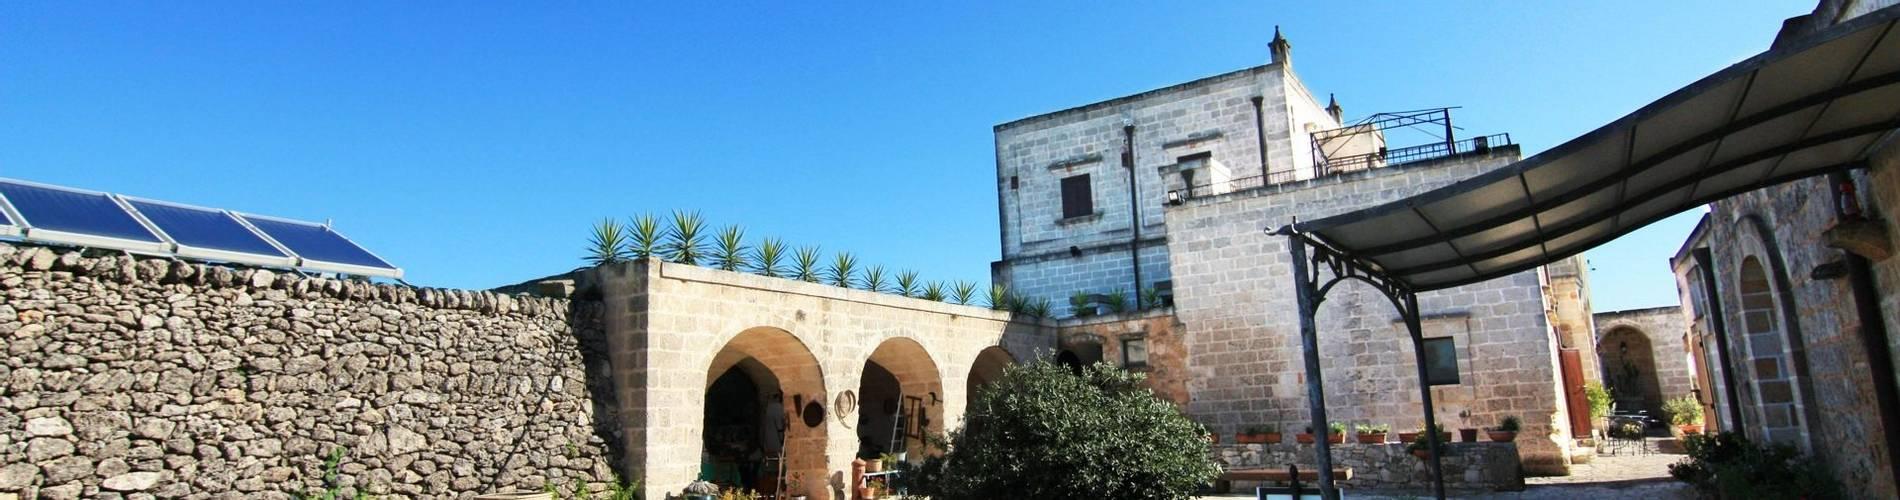 Masseria Bosco 9.jpg